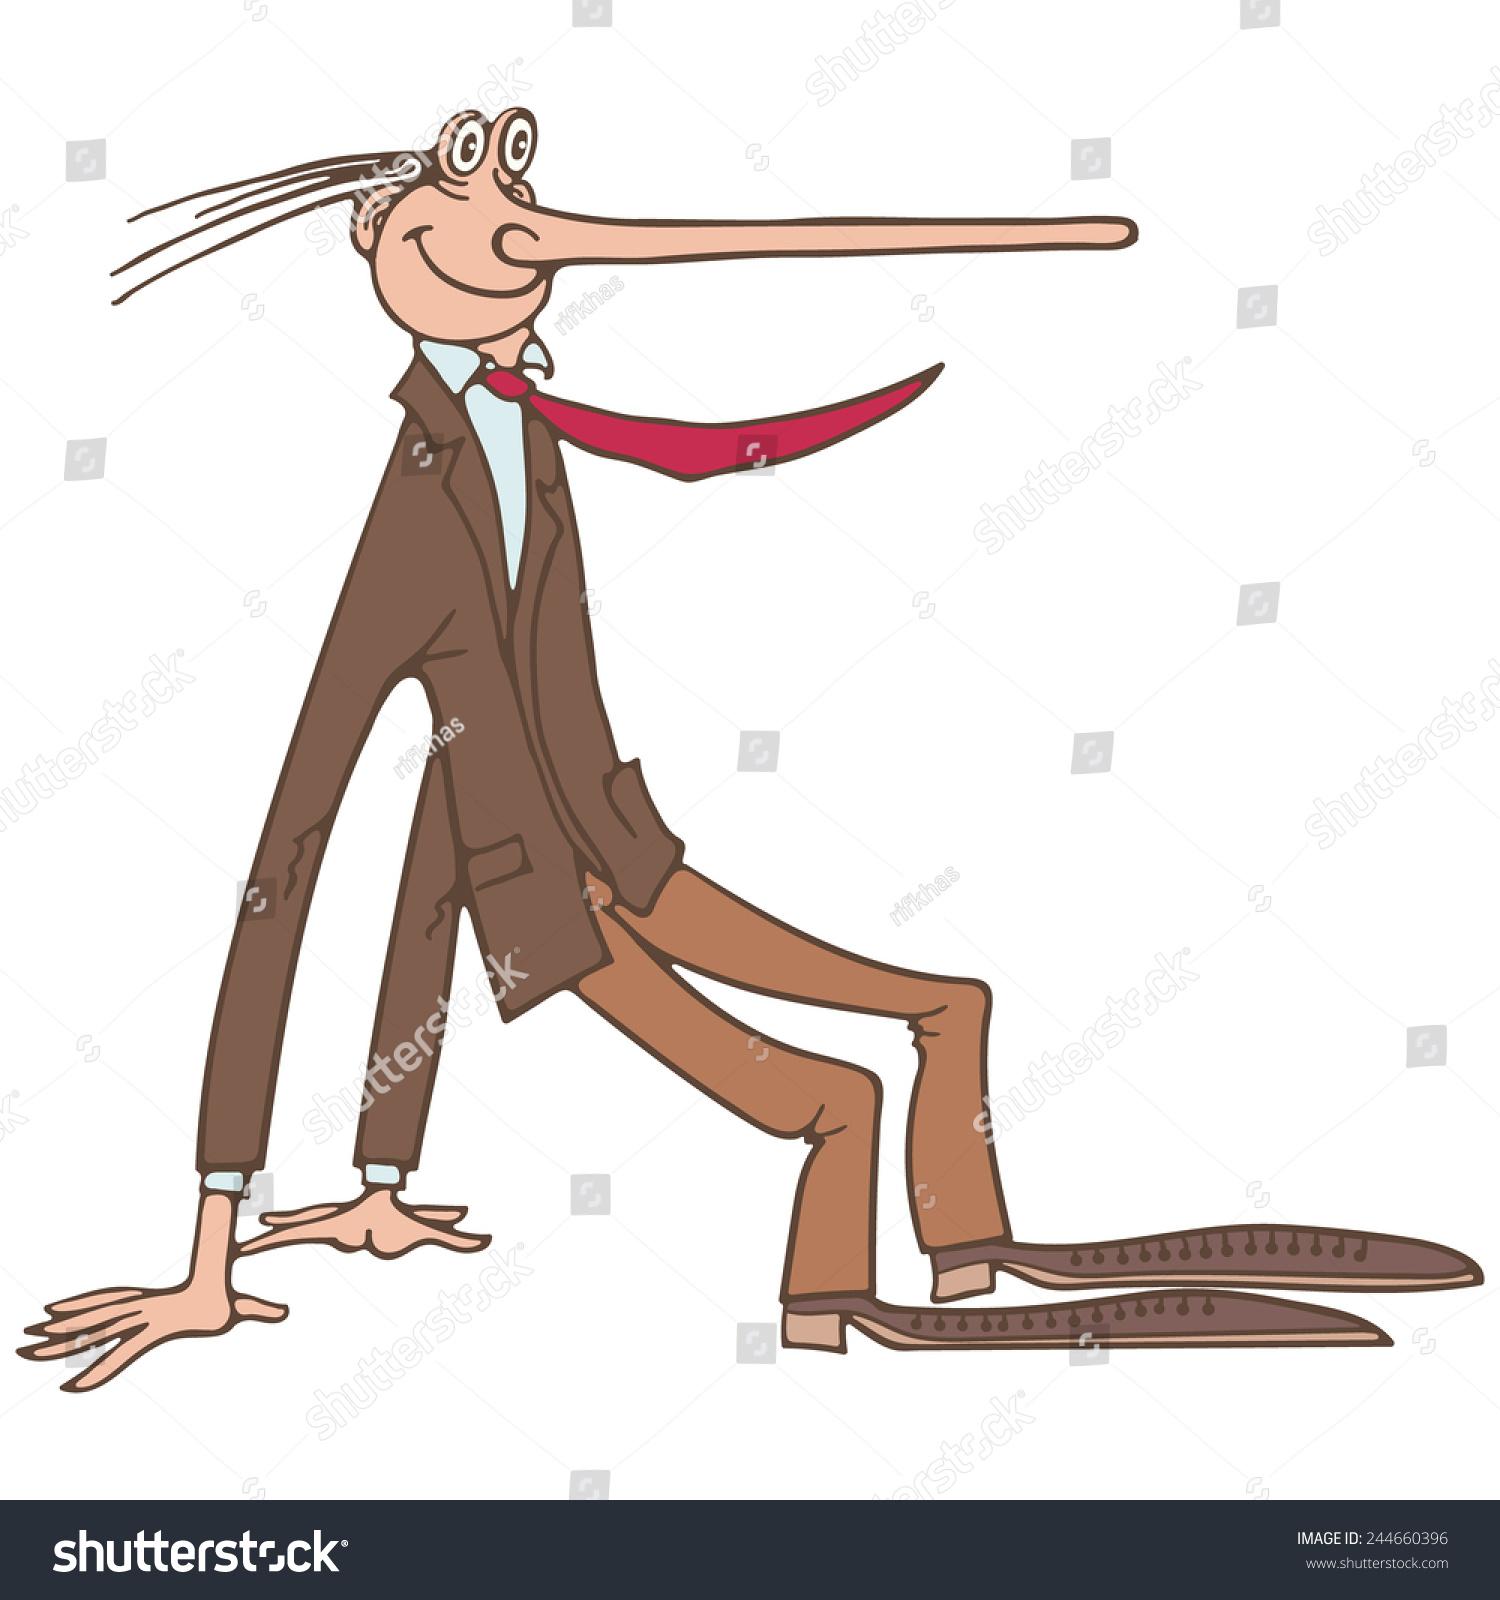 Odd Man Out Cartoon Man Suit Stock Vector HD (Royalty Free ...